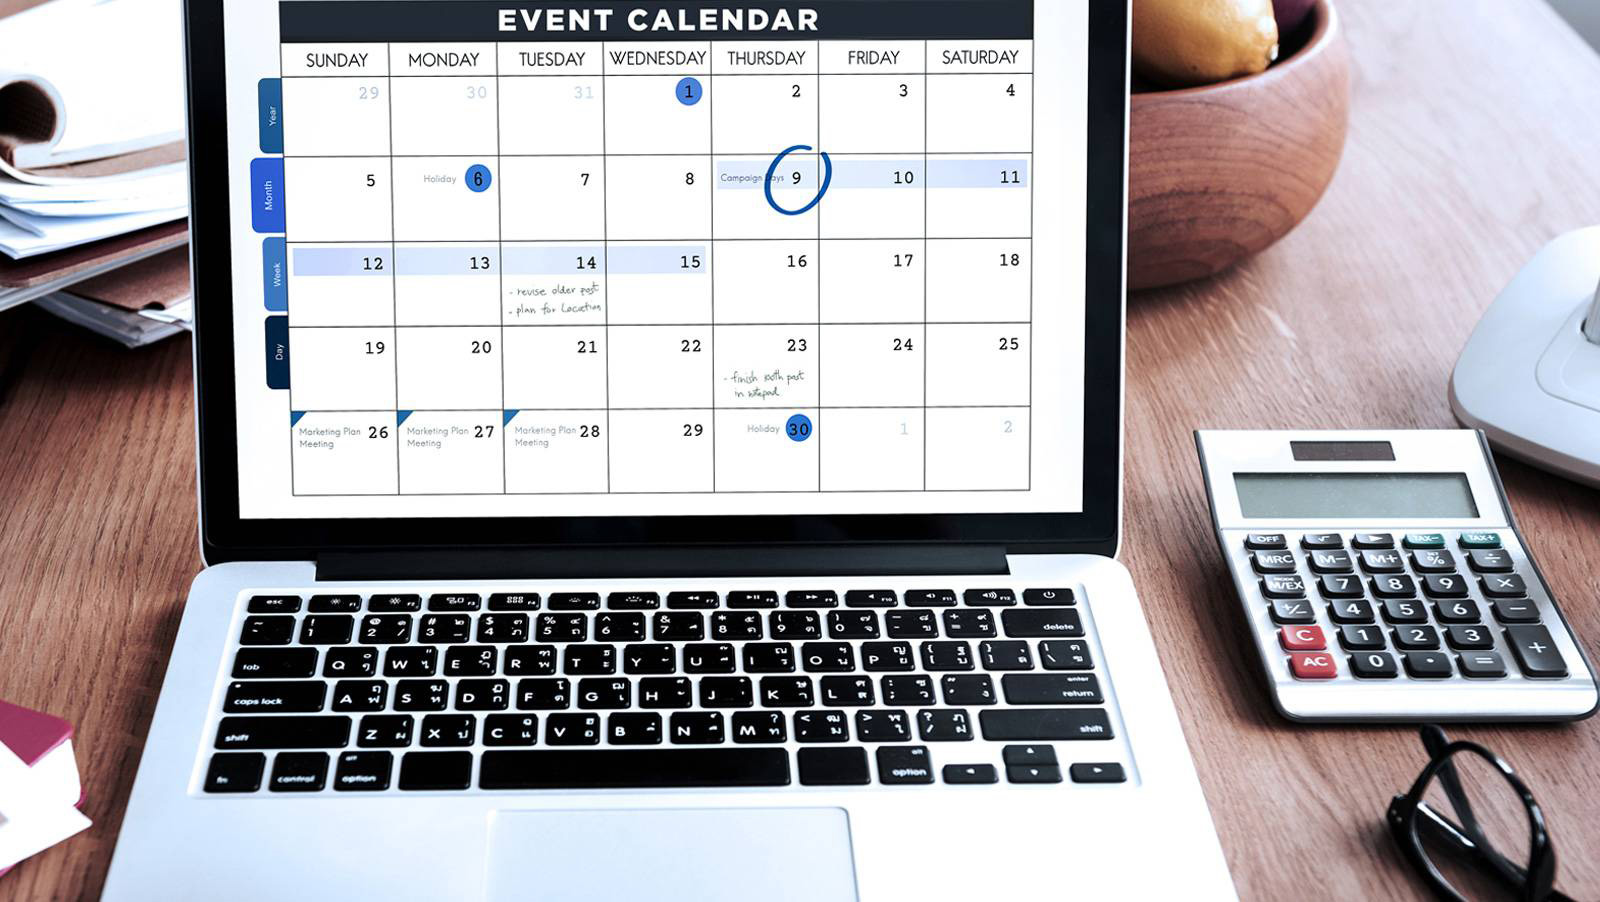 CalvinAyre.com April 2019 Featured Conferences & Events